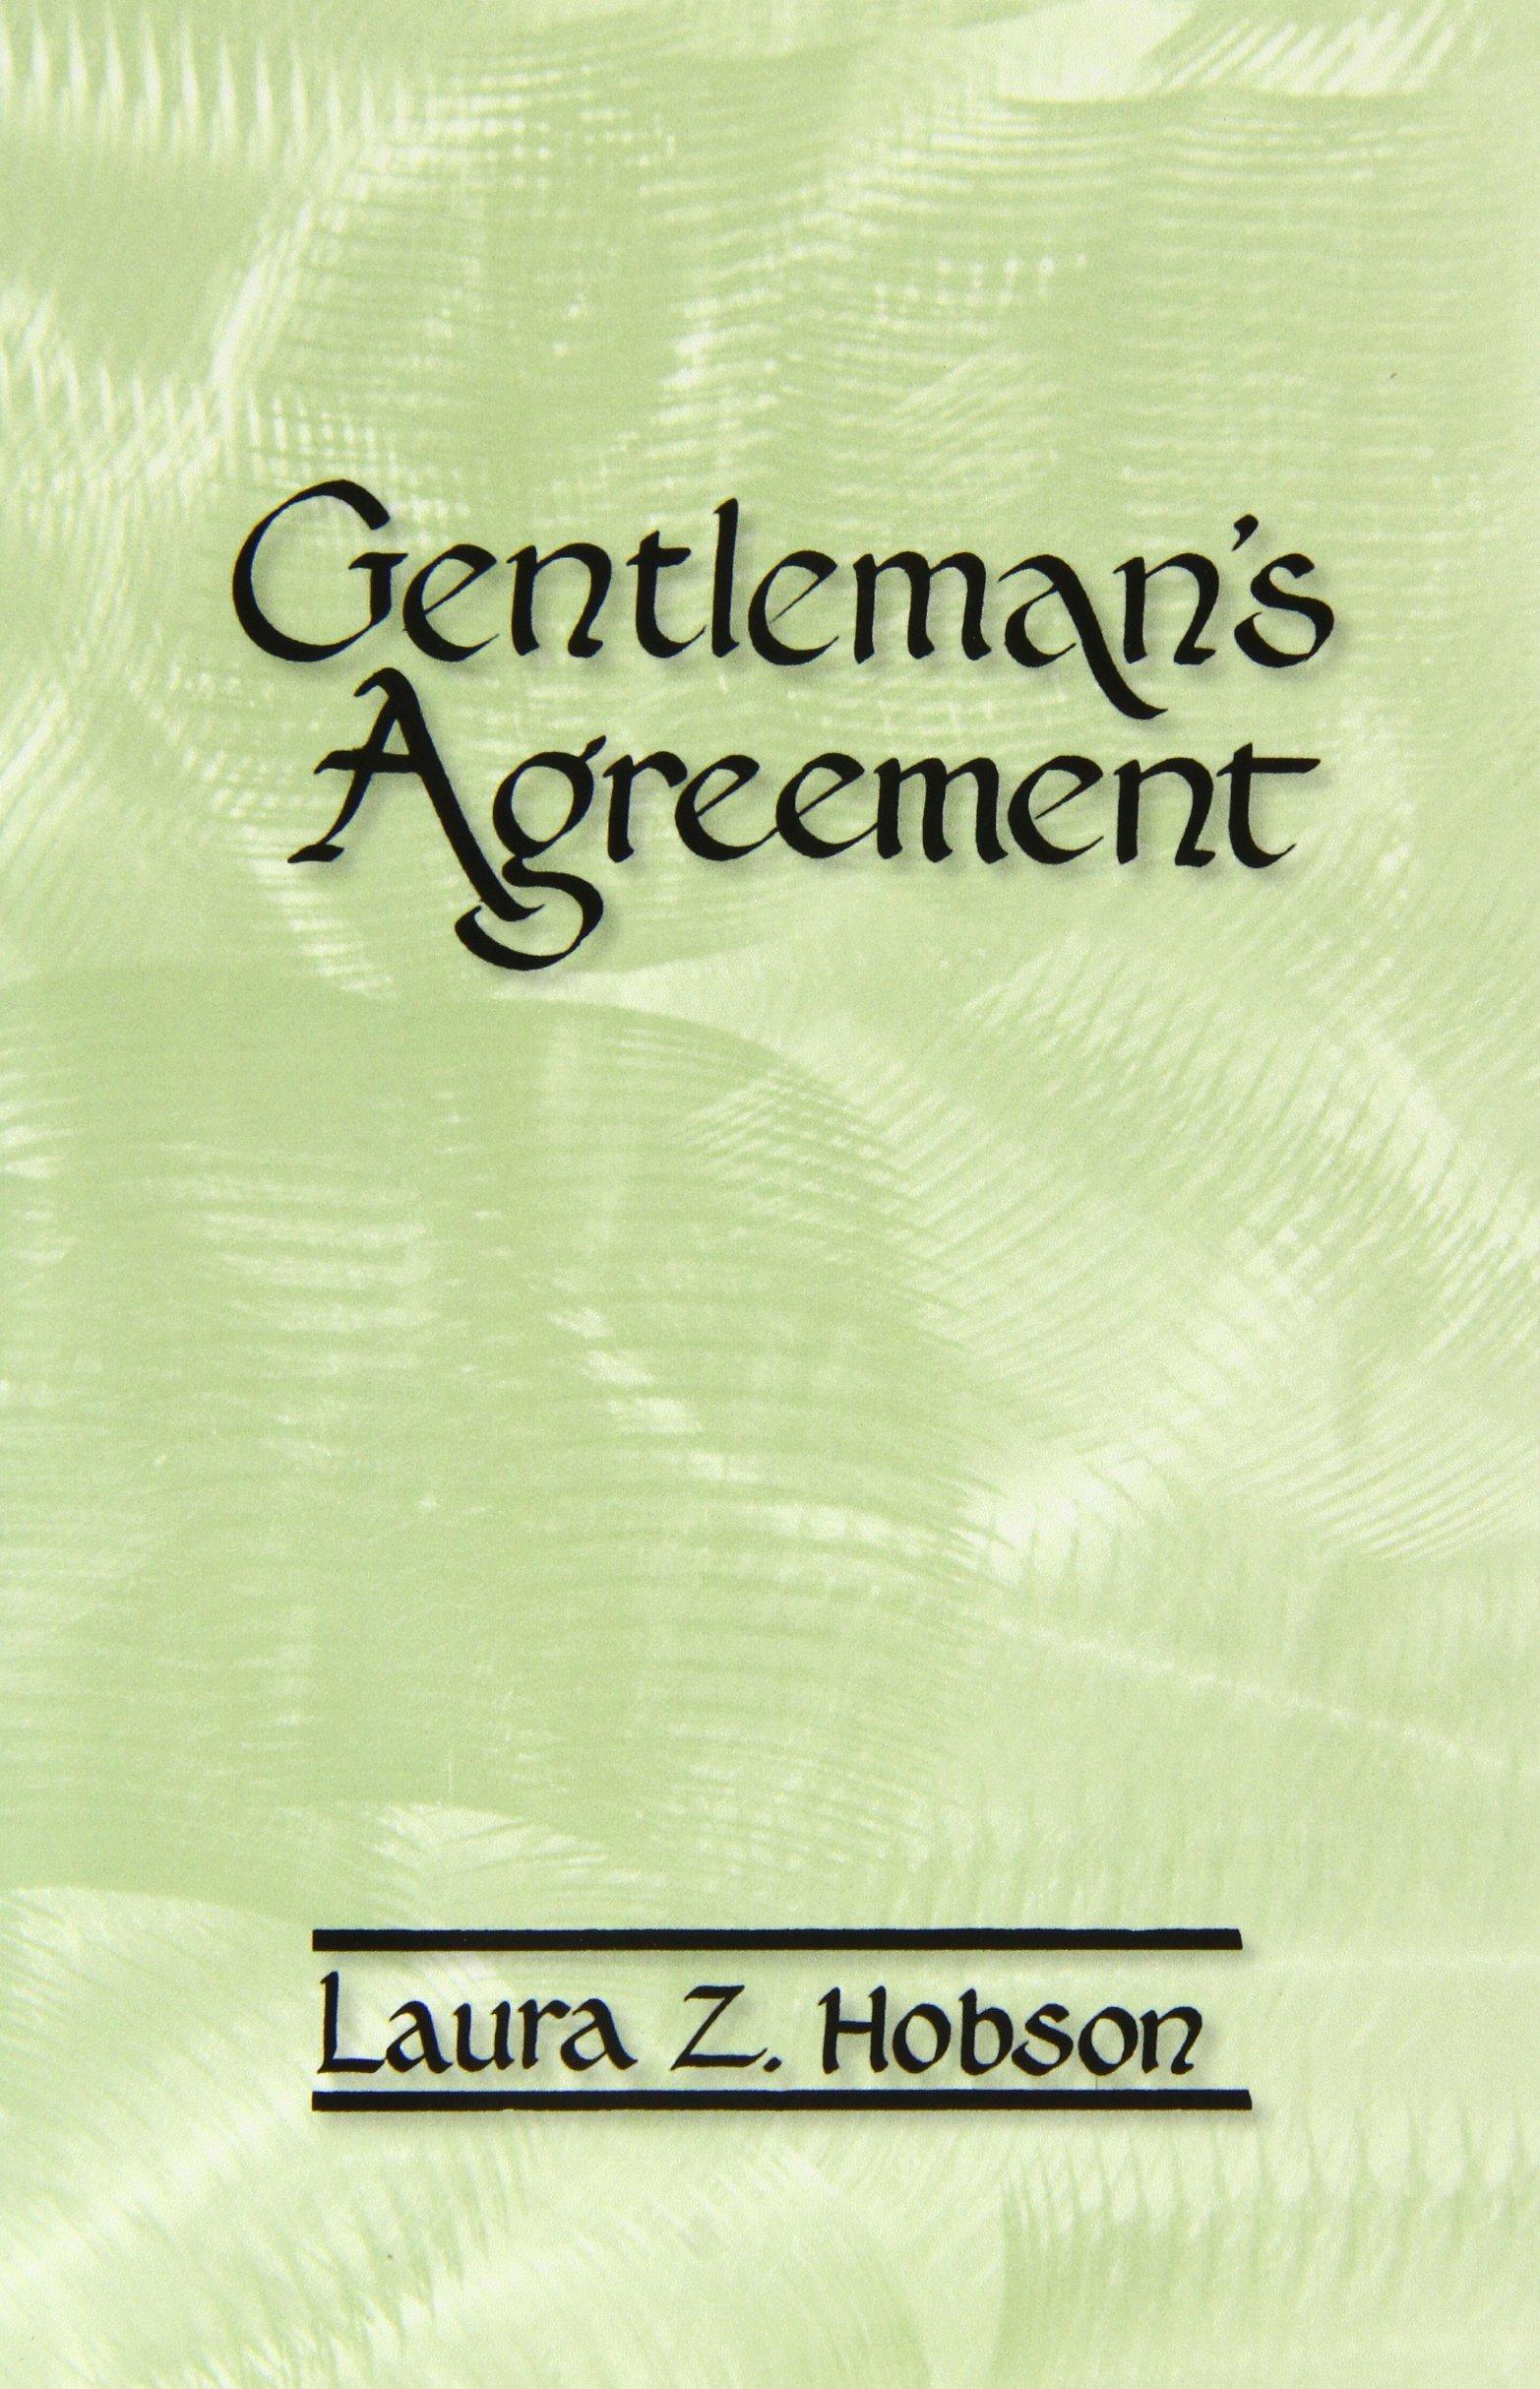 Gentlemans Agreement Laura Z Hobson 9780877973256 Amazon Books